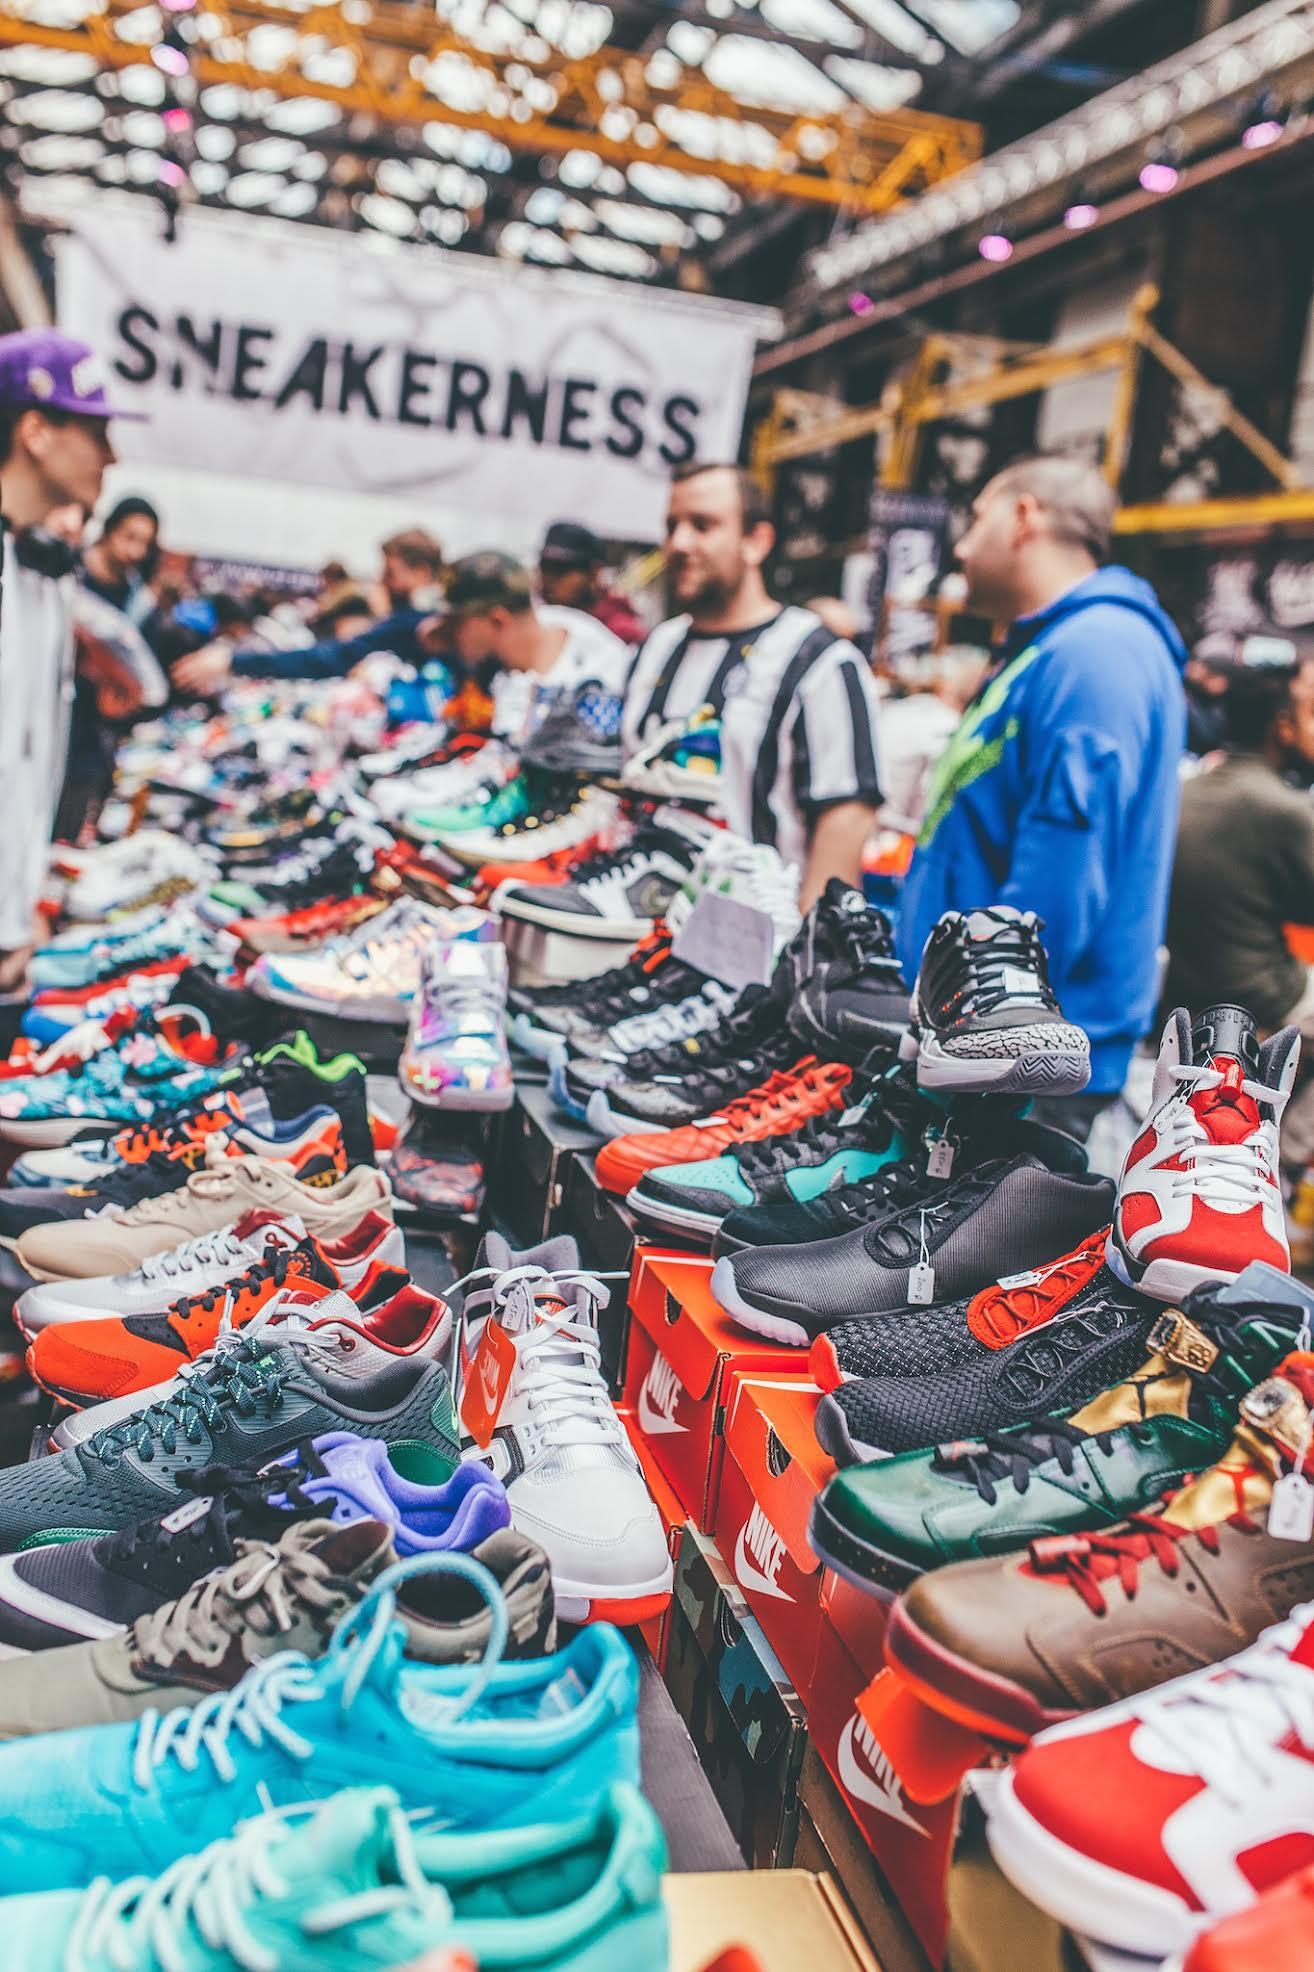 Sneakerness Milan 2018 PARTY EVENTO milano scarpe fiera evento